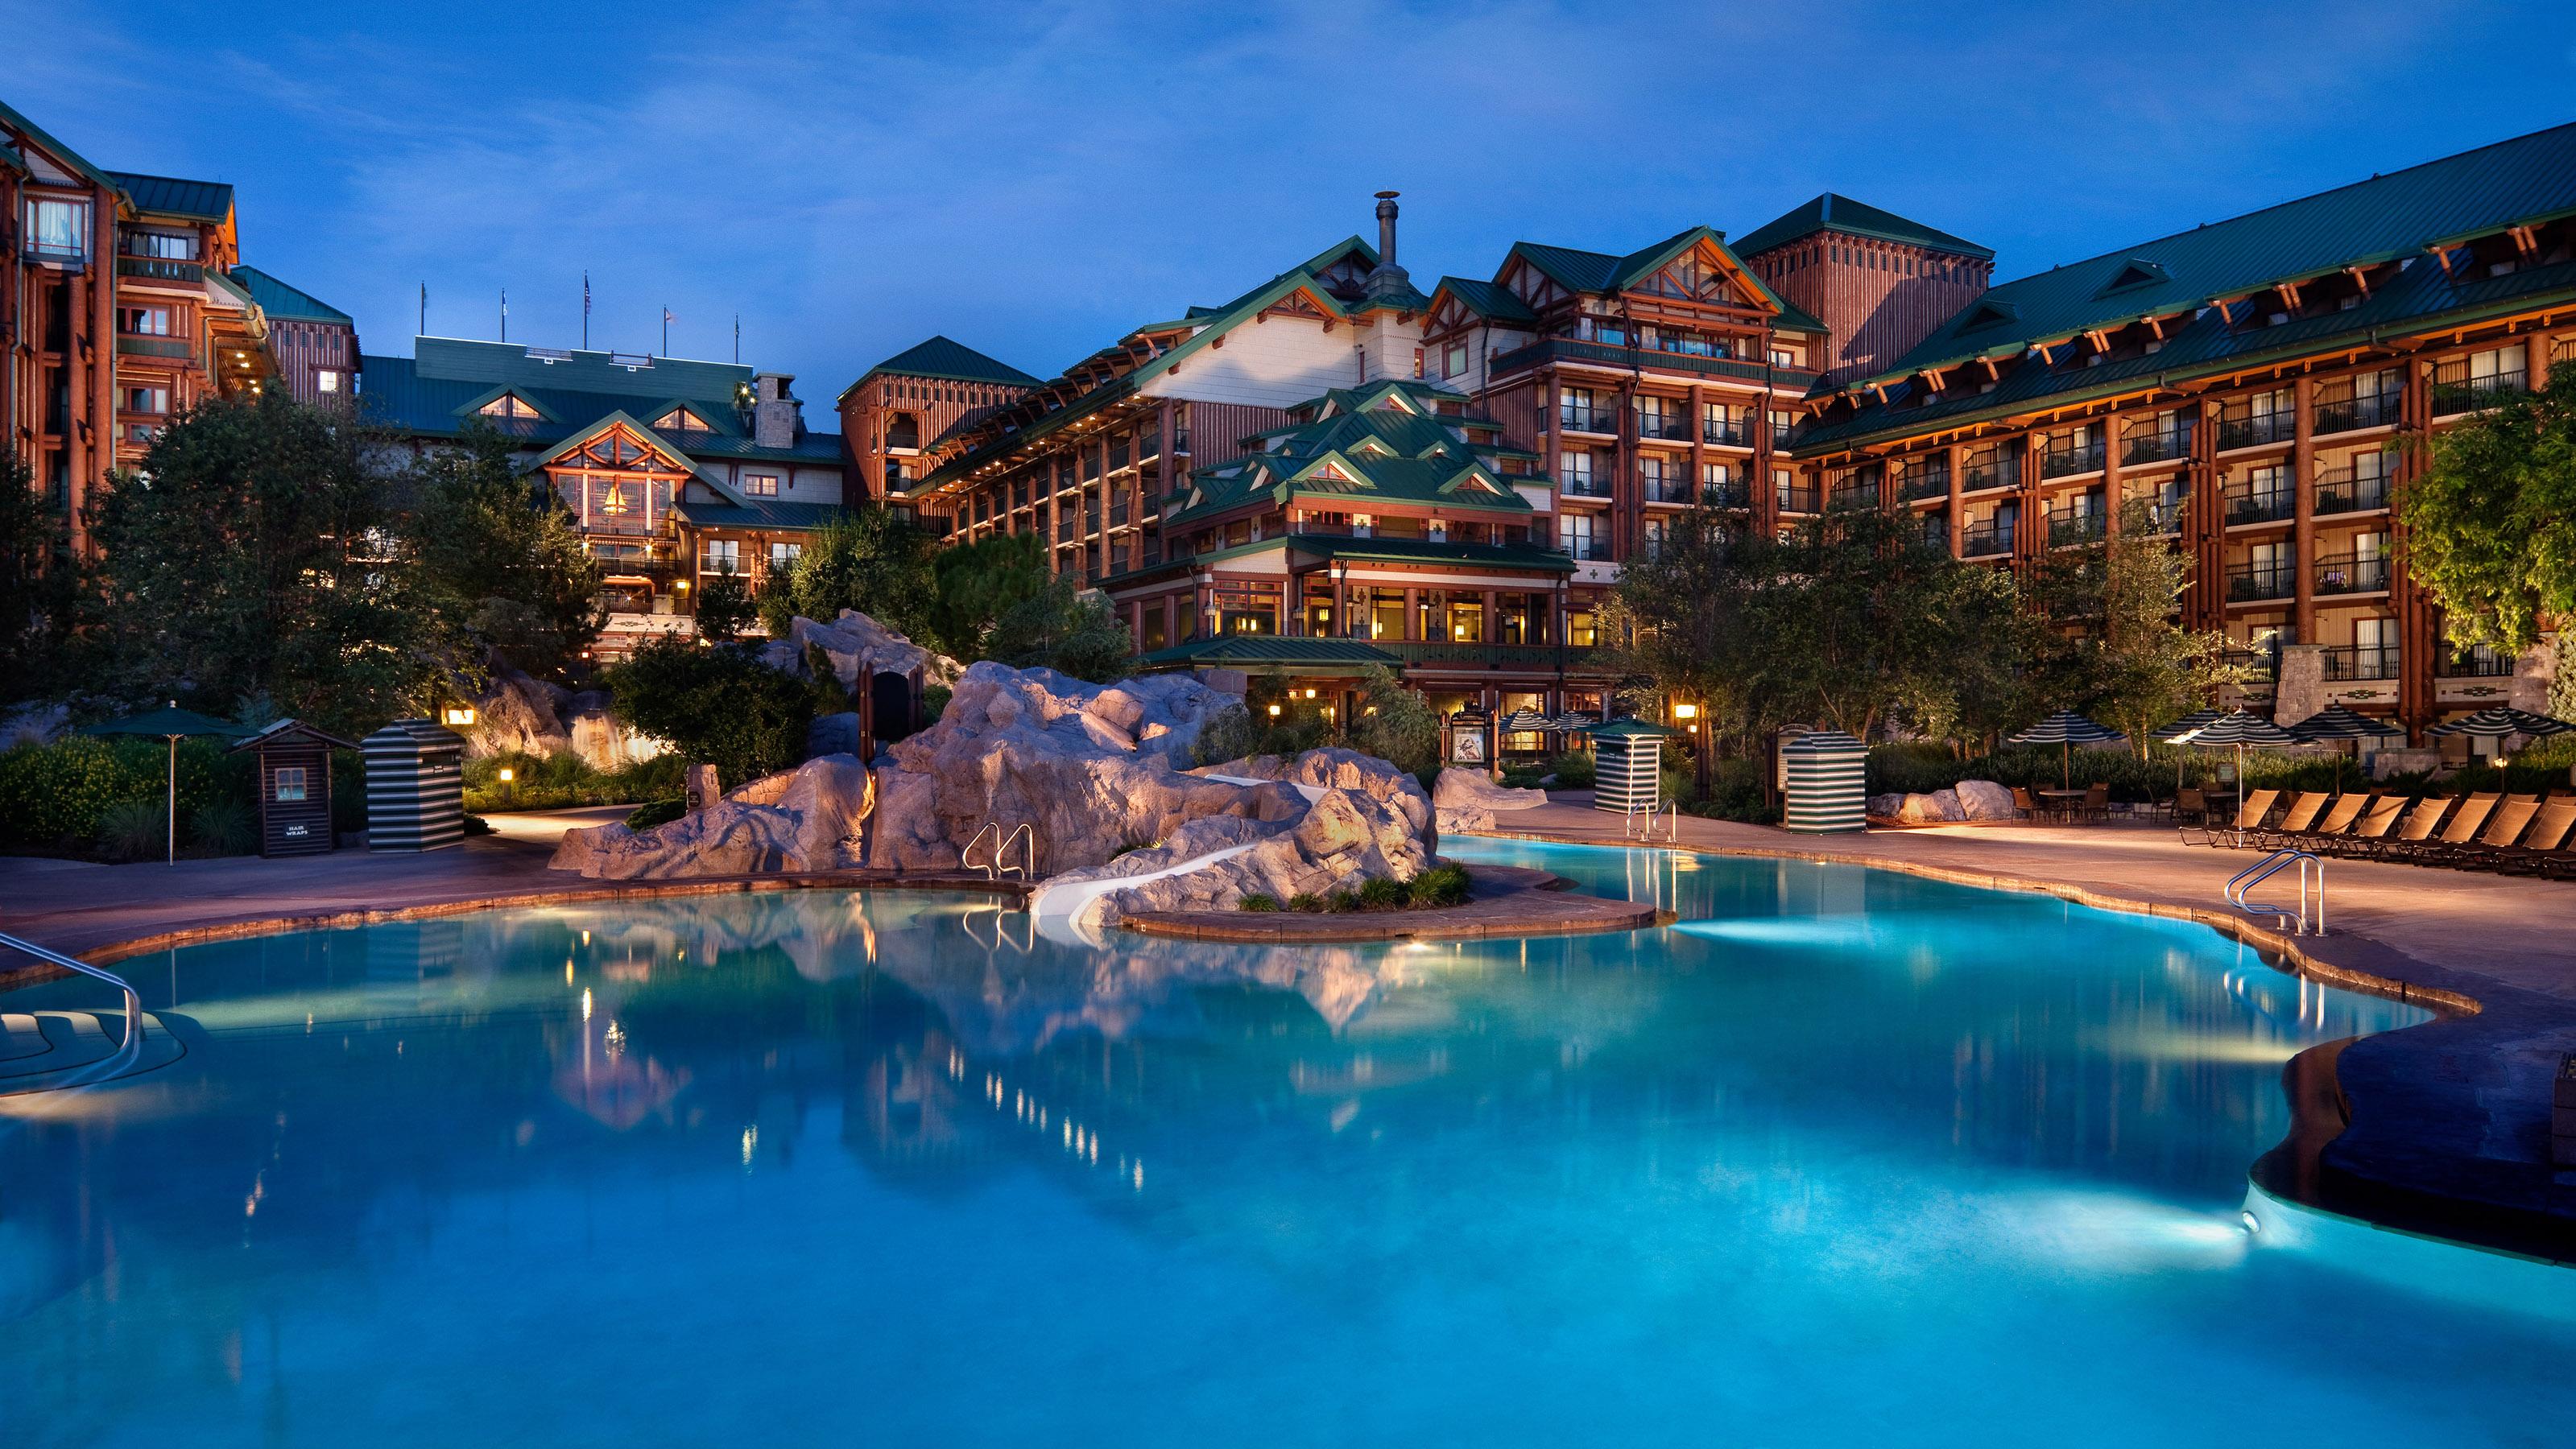 Disney's Wilderness Lodge: Serene Luxury